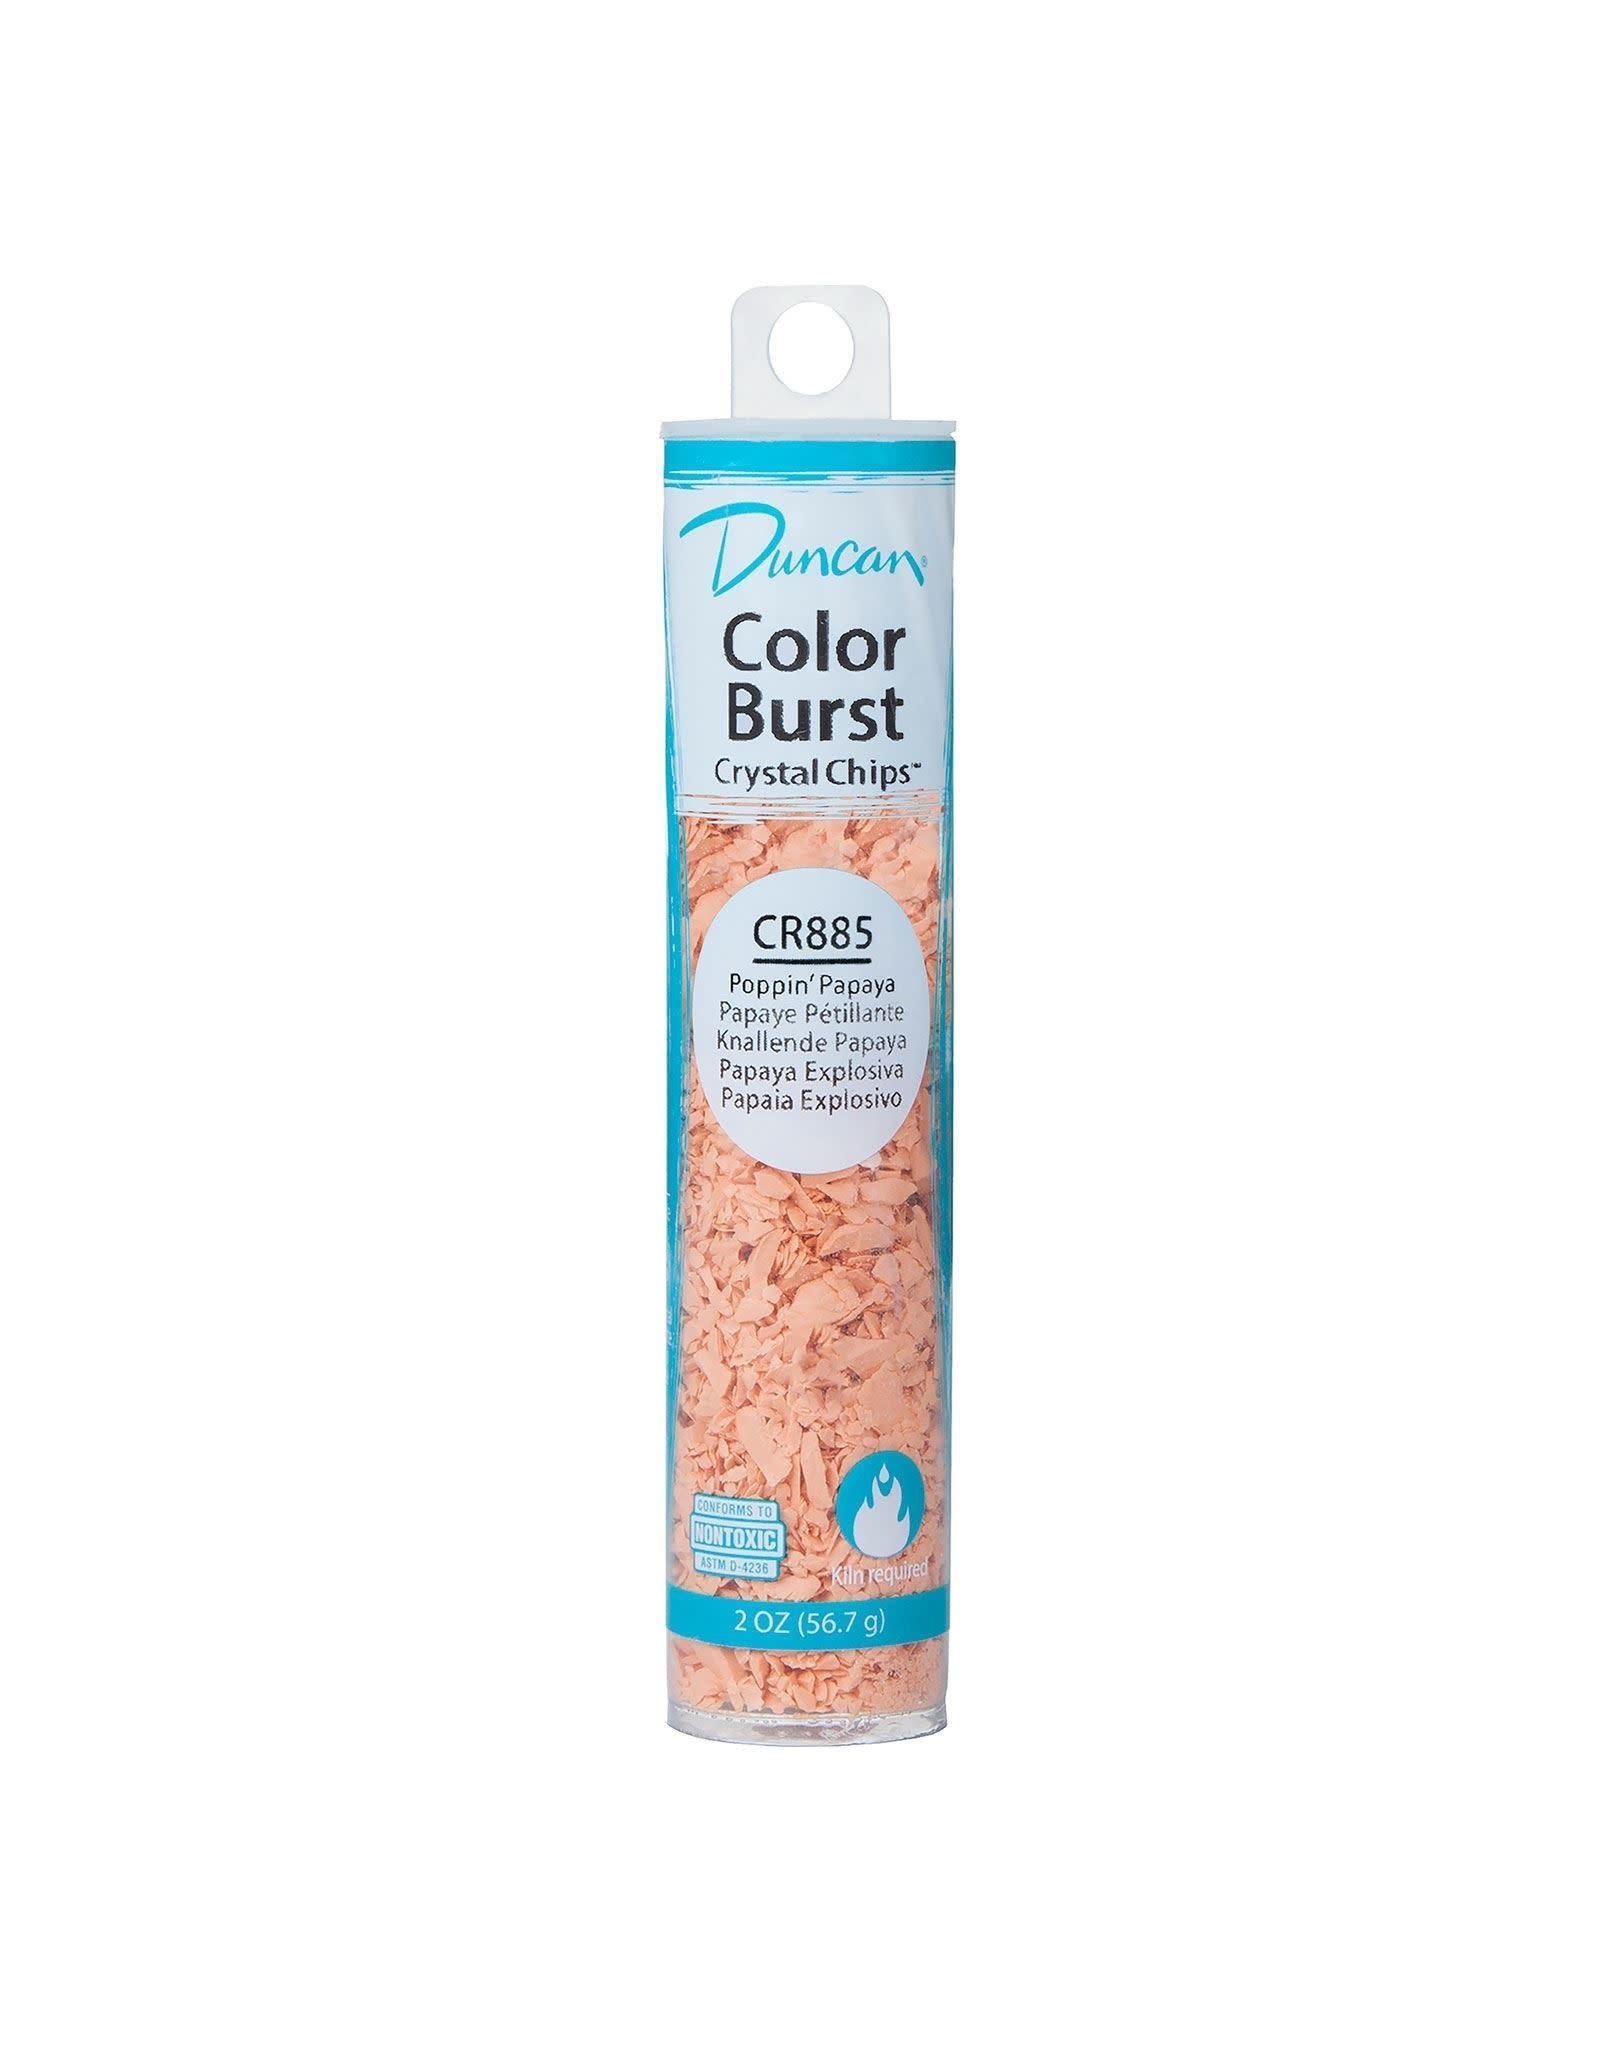 Duncan Poppin' Papaya Colour Burst Crystal Chips